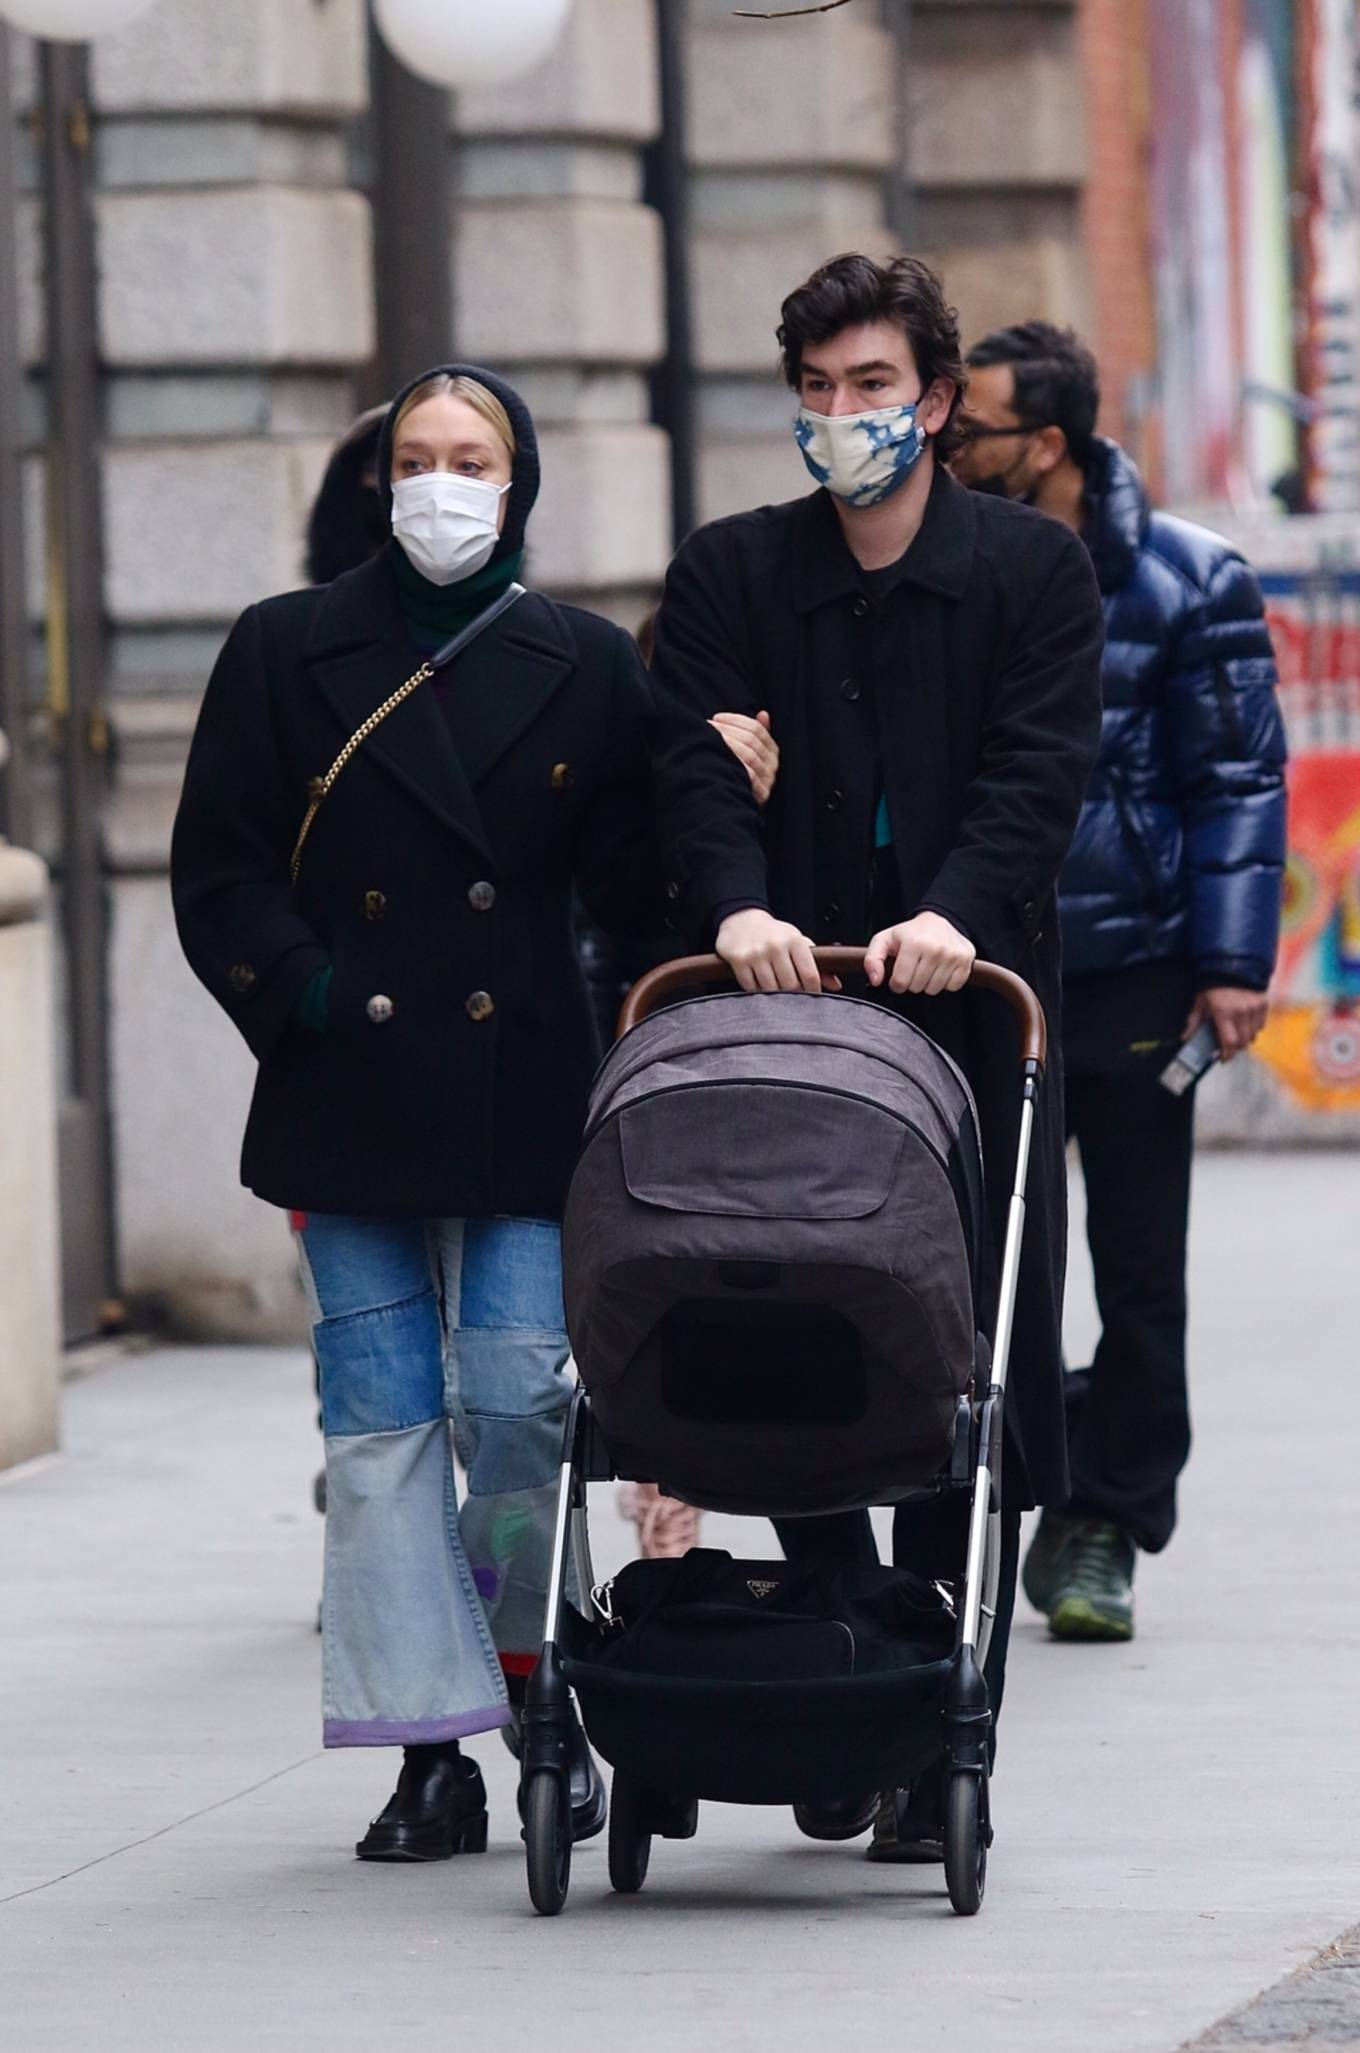 Chloe Sevigny - With Sinisa Mackovic and their baby in Manhattan's Soho area